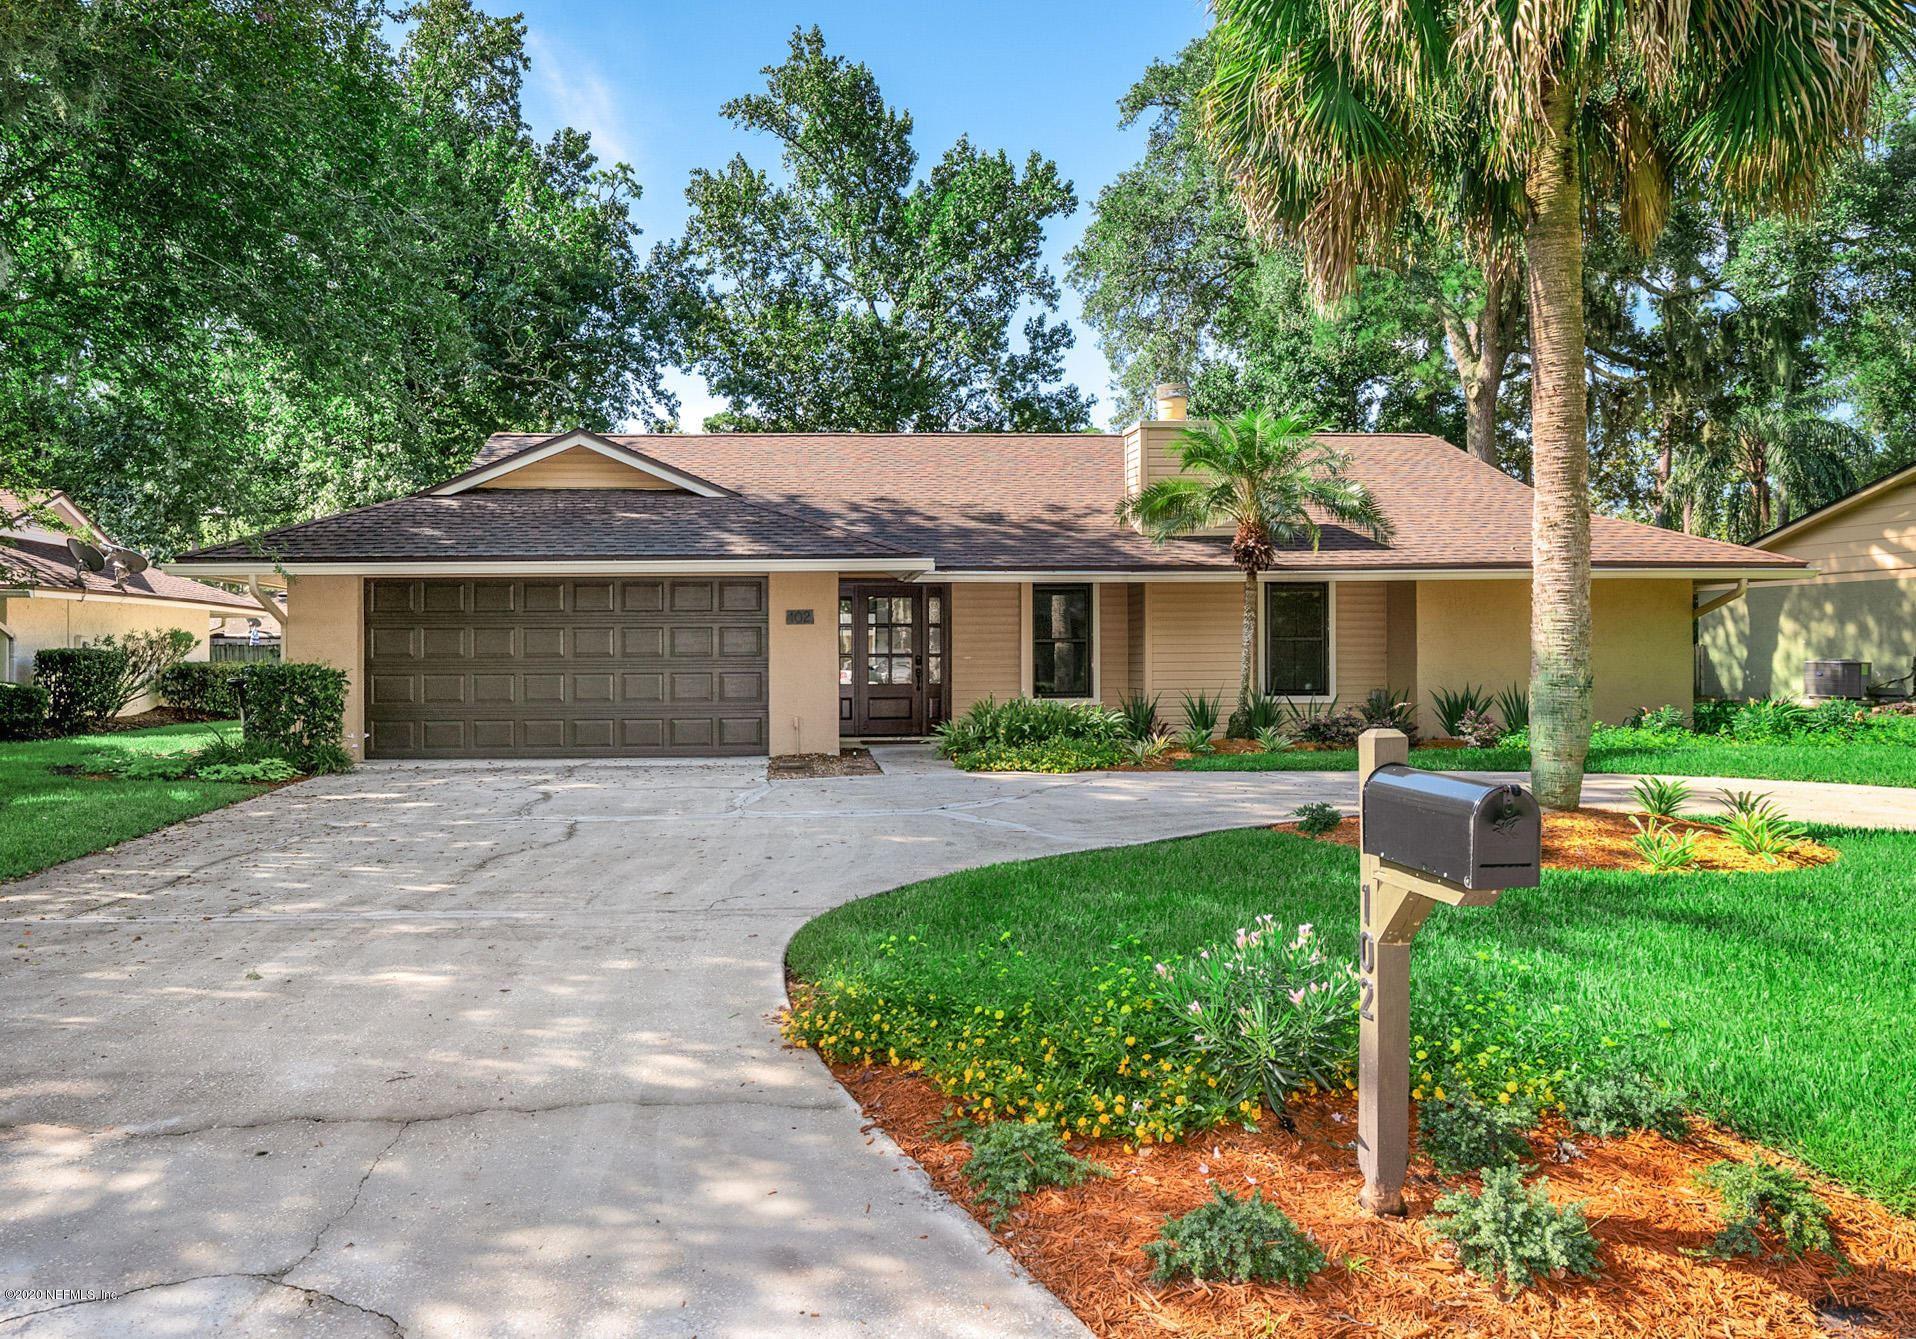 102 ABALONE LN #Lot No: 12, Ponte Vedra Beach, FL 32082 - MLS#: 1068671